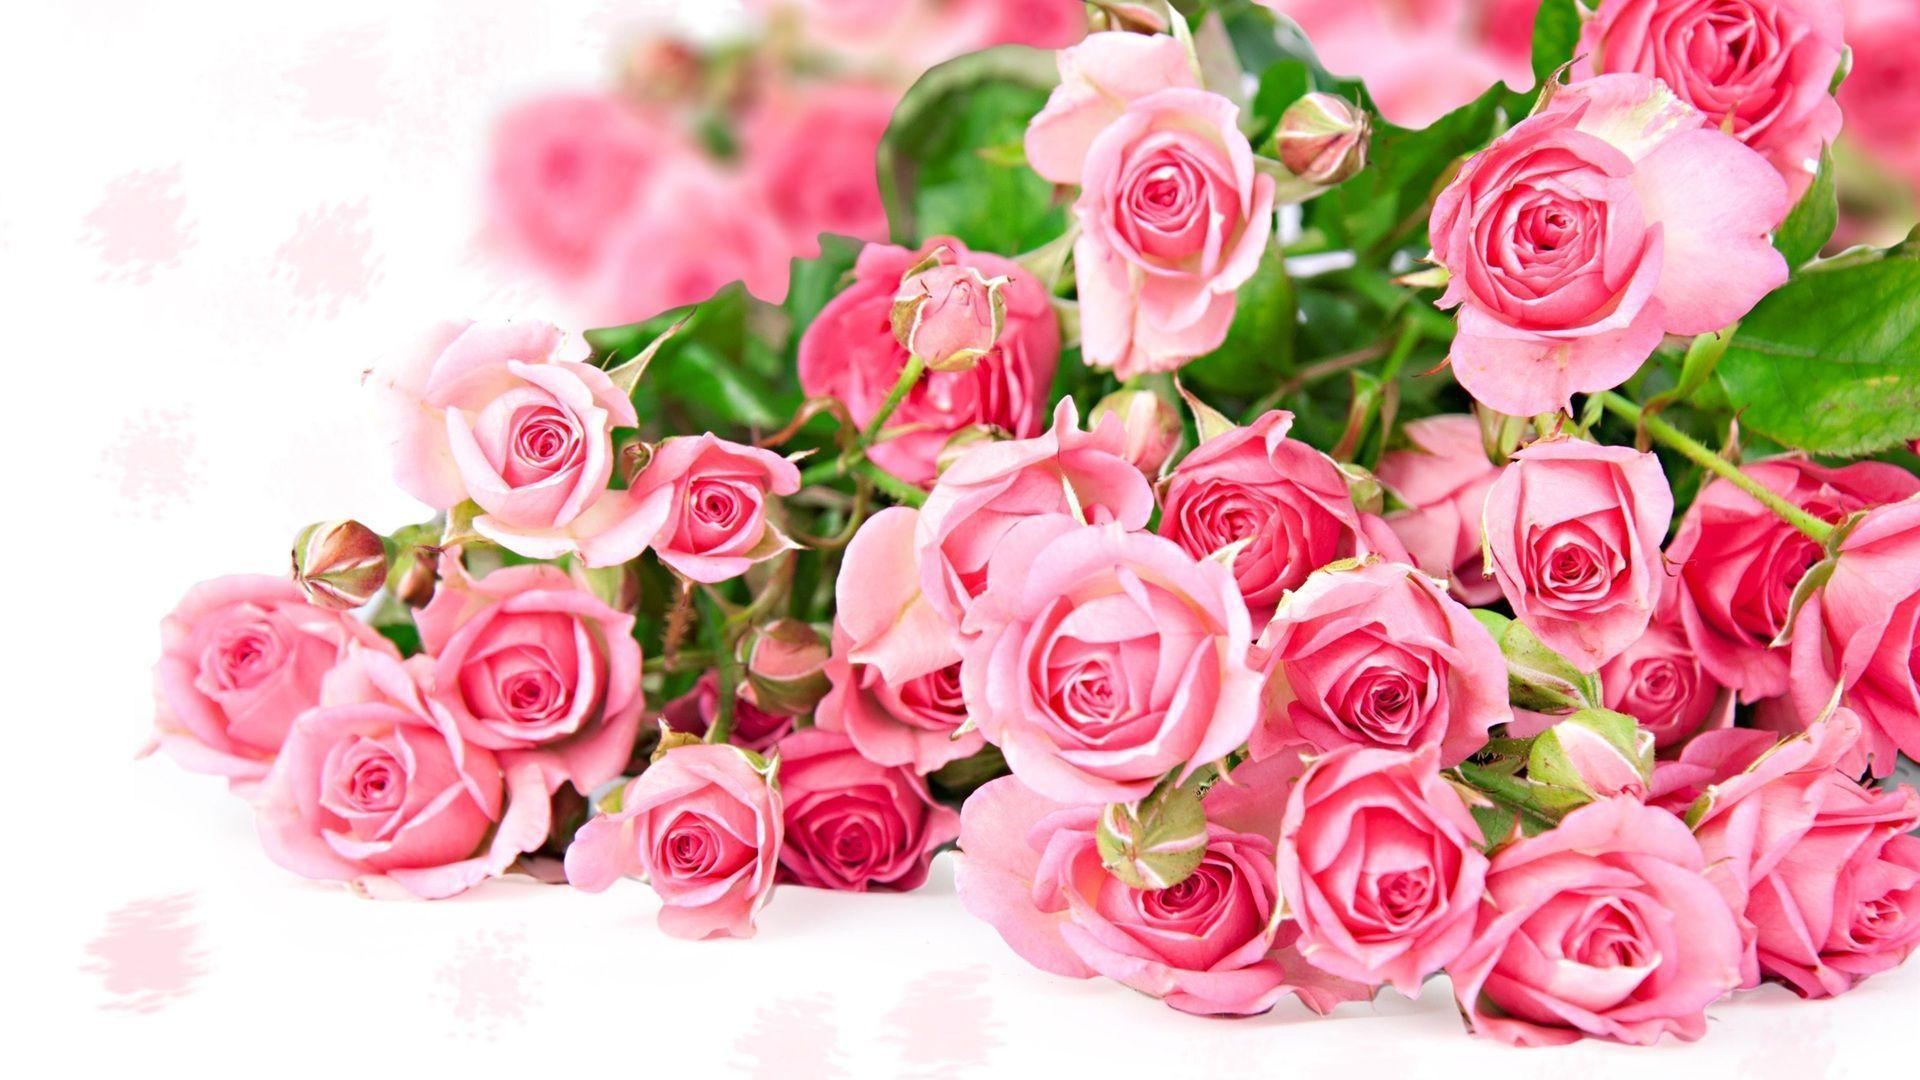 pink rose wallpaper 3d